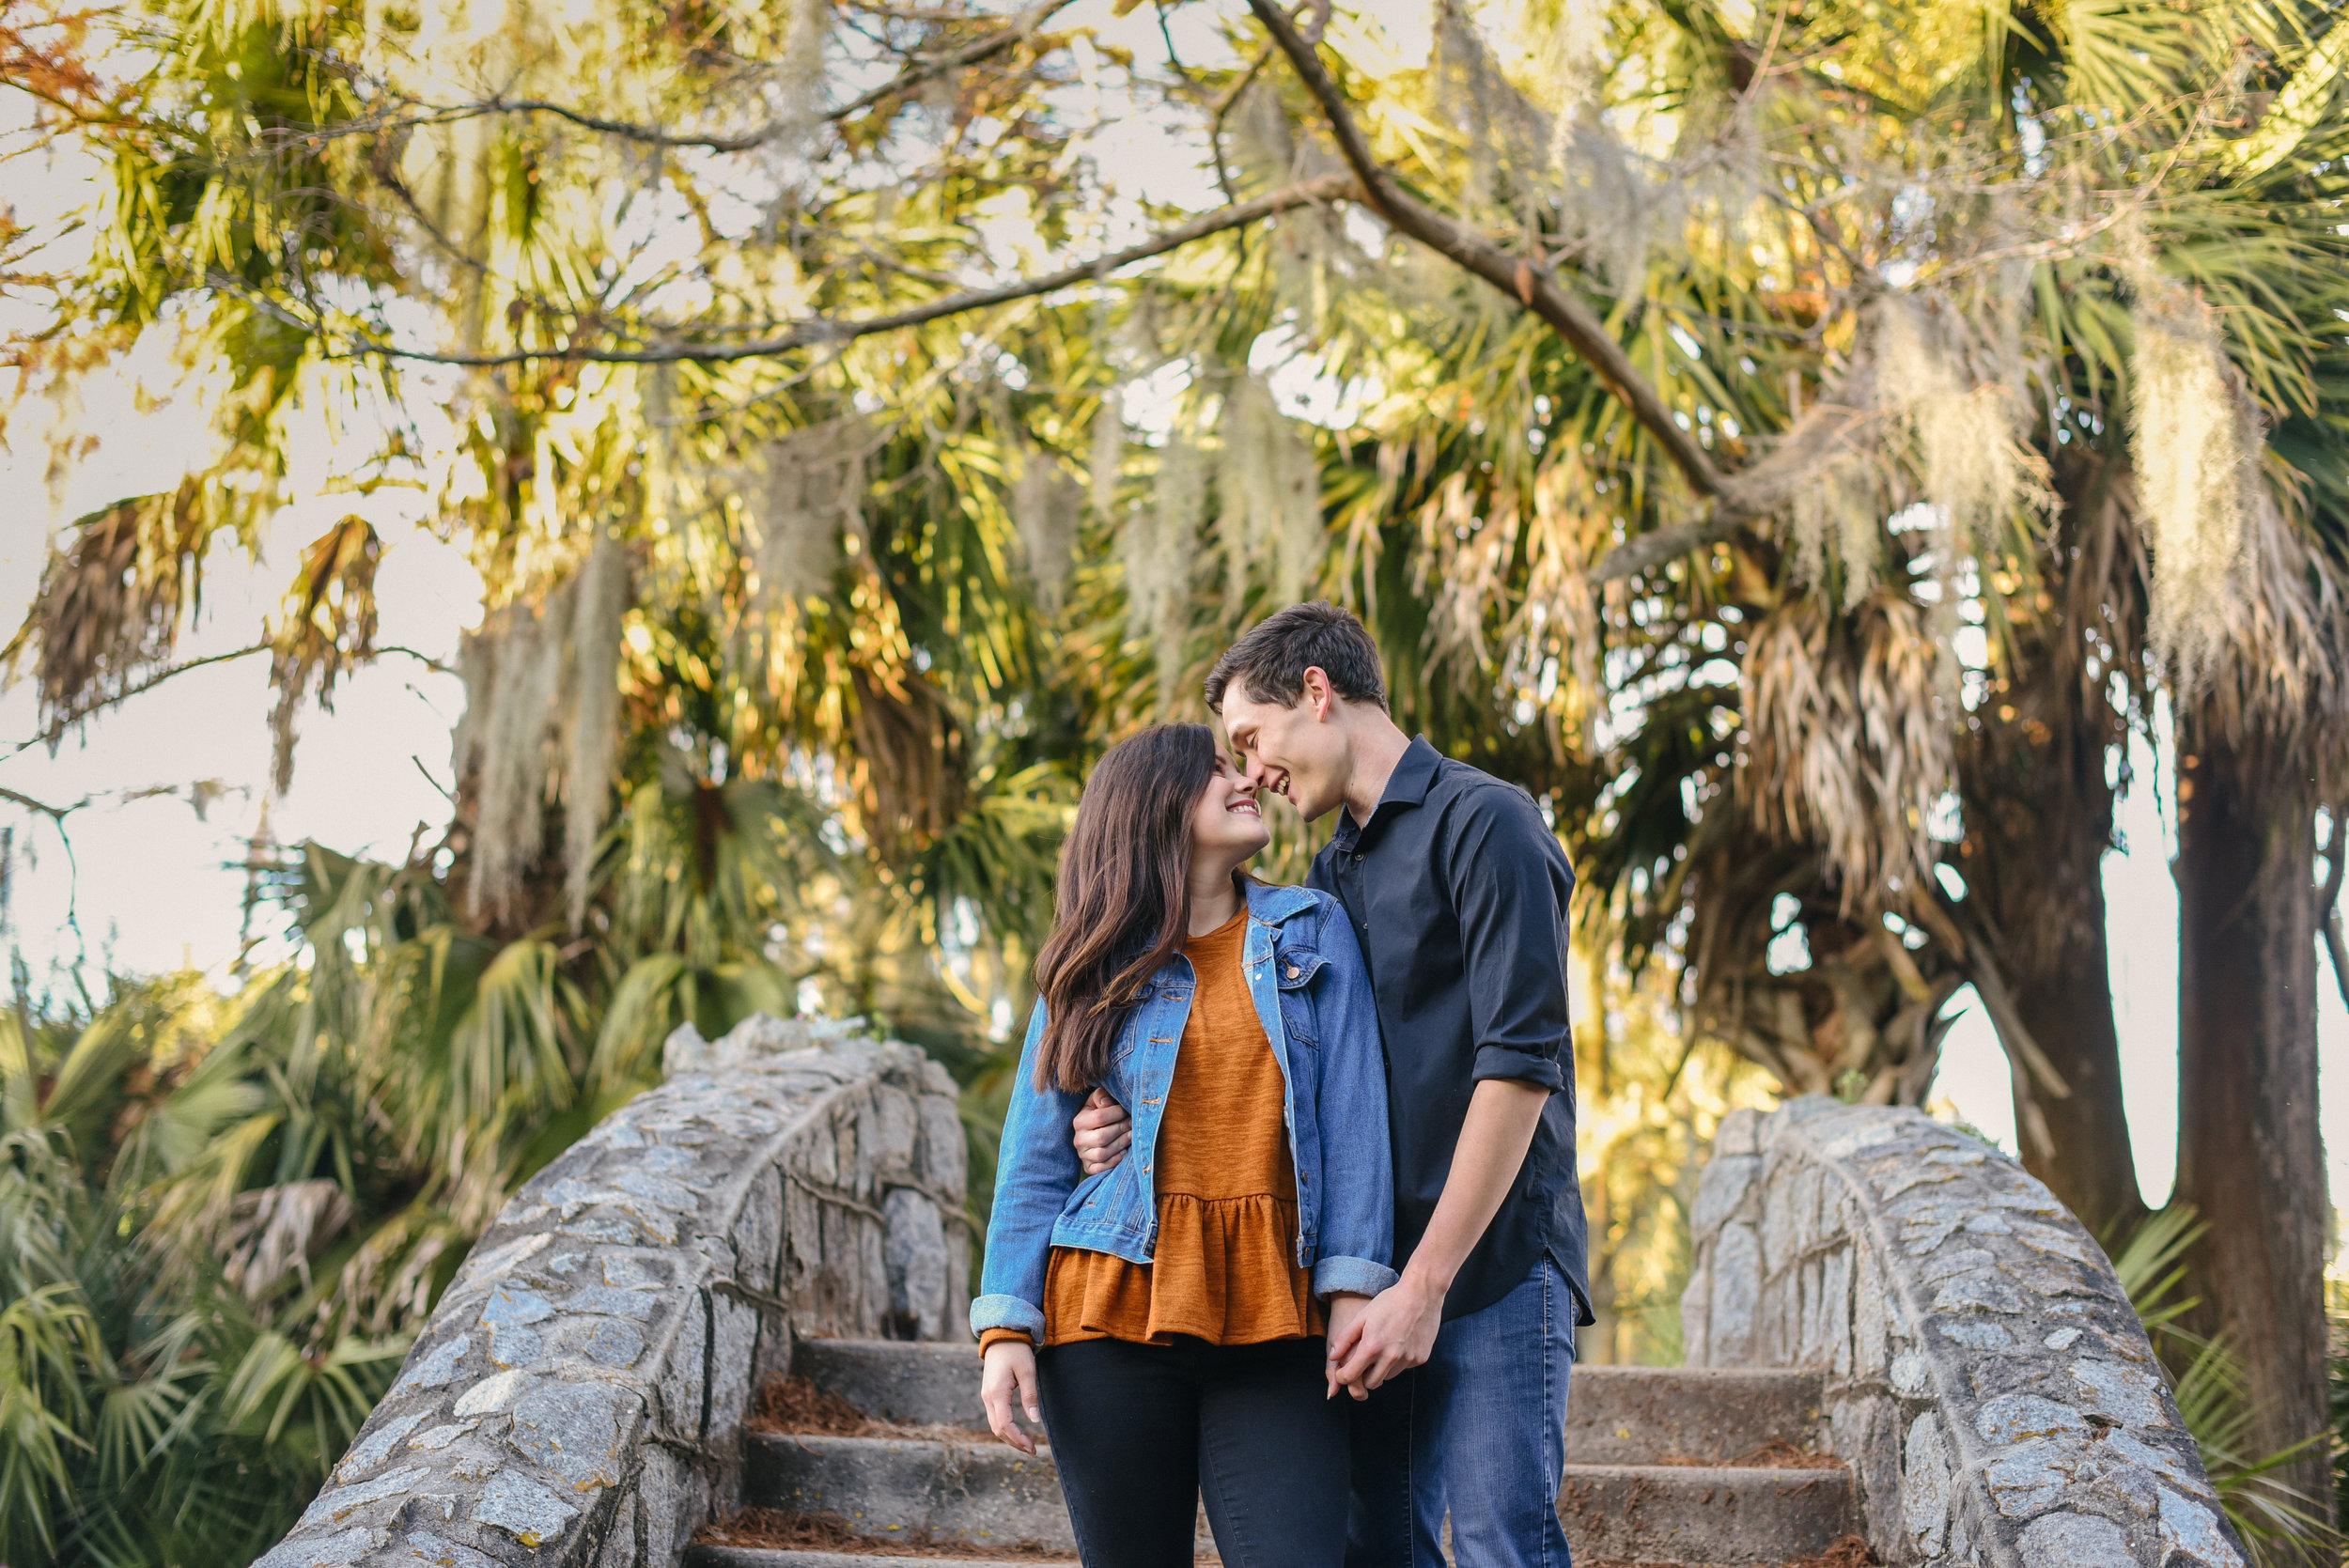 Dwight & Deajha Engagement_122218-129.jpg